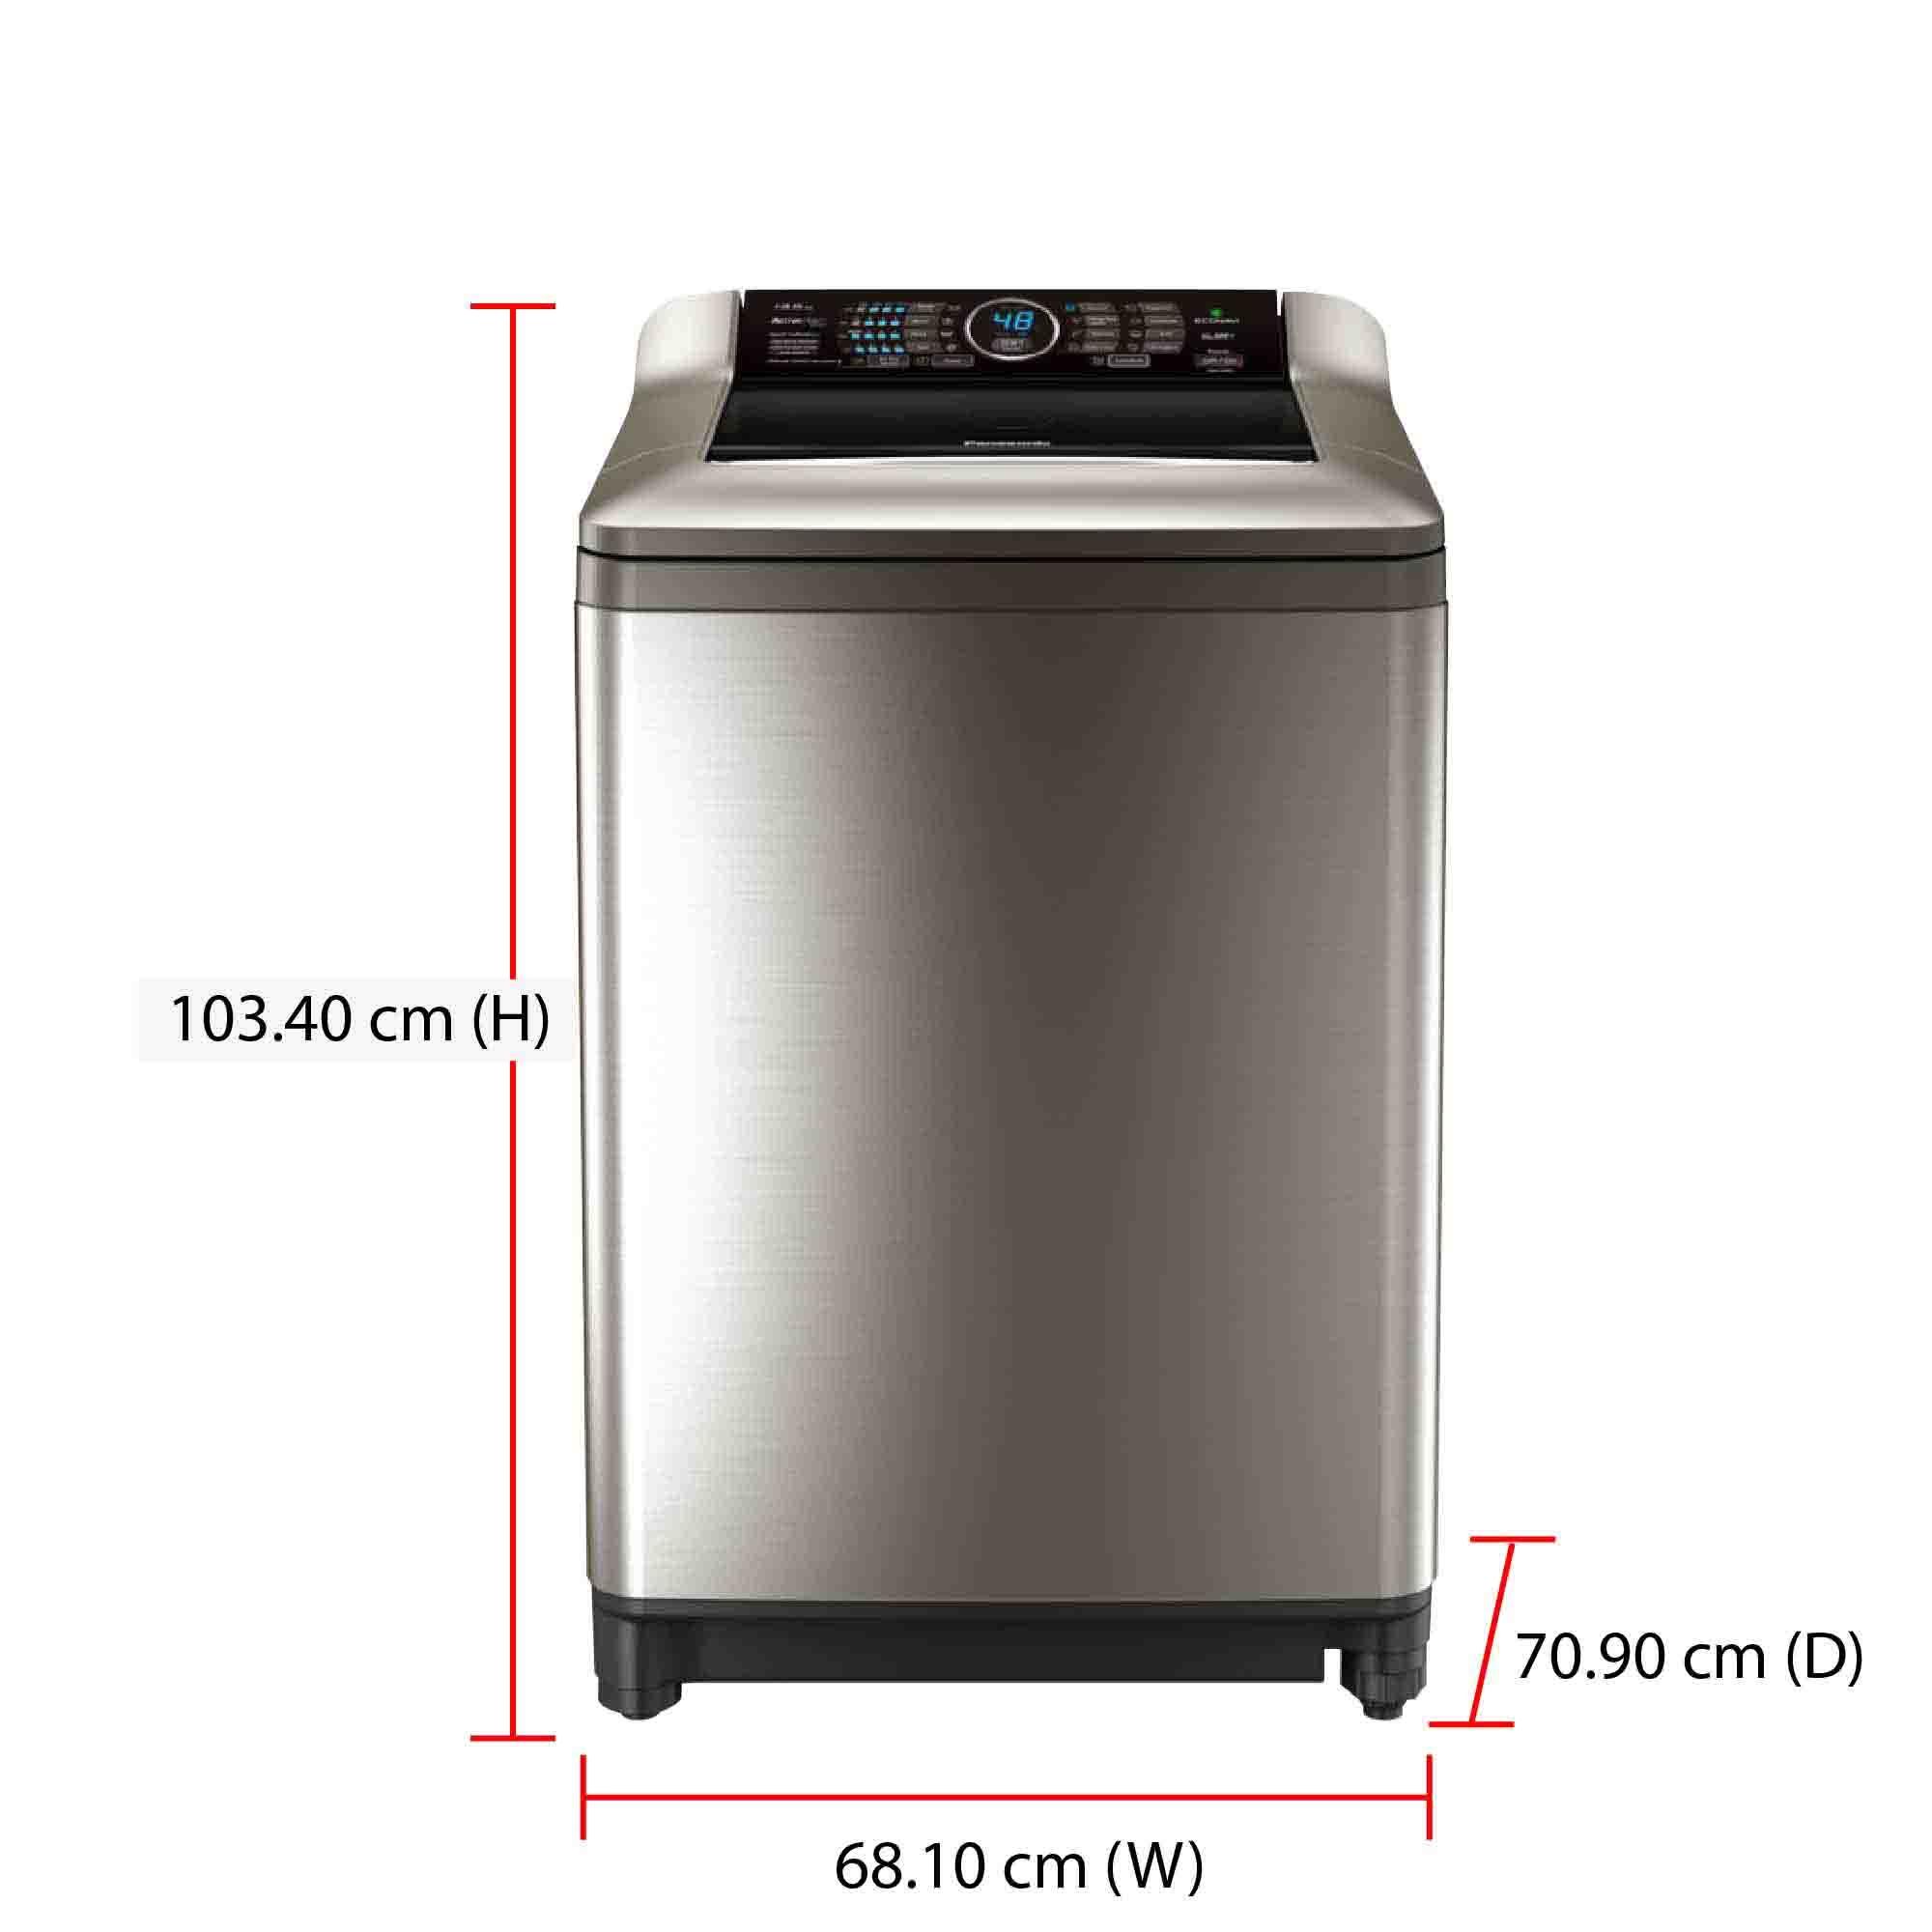 Panasonic Washing Machine Free Download Wiring Diagram Na F135x4 End 5 2 2020 8 51 Pm